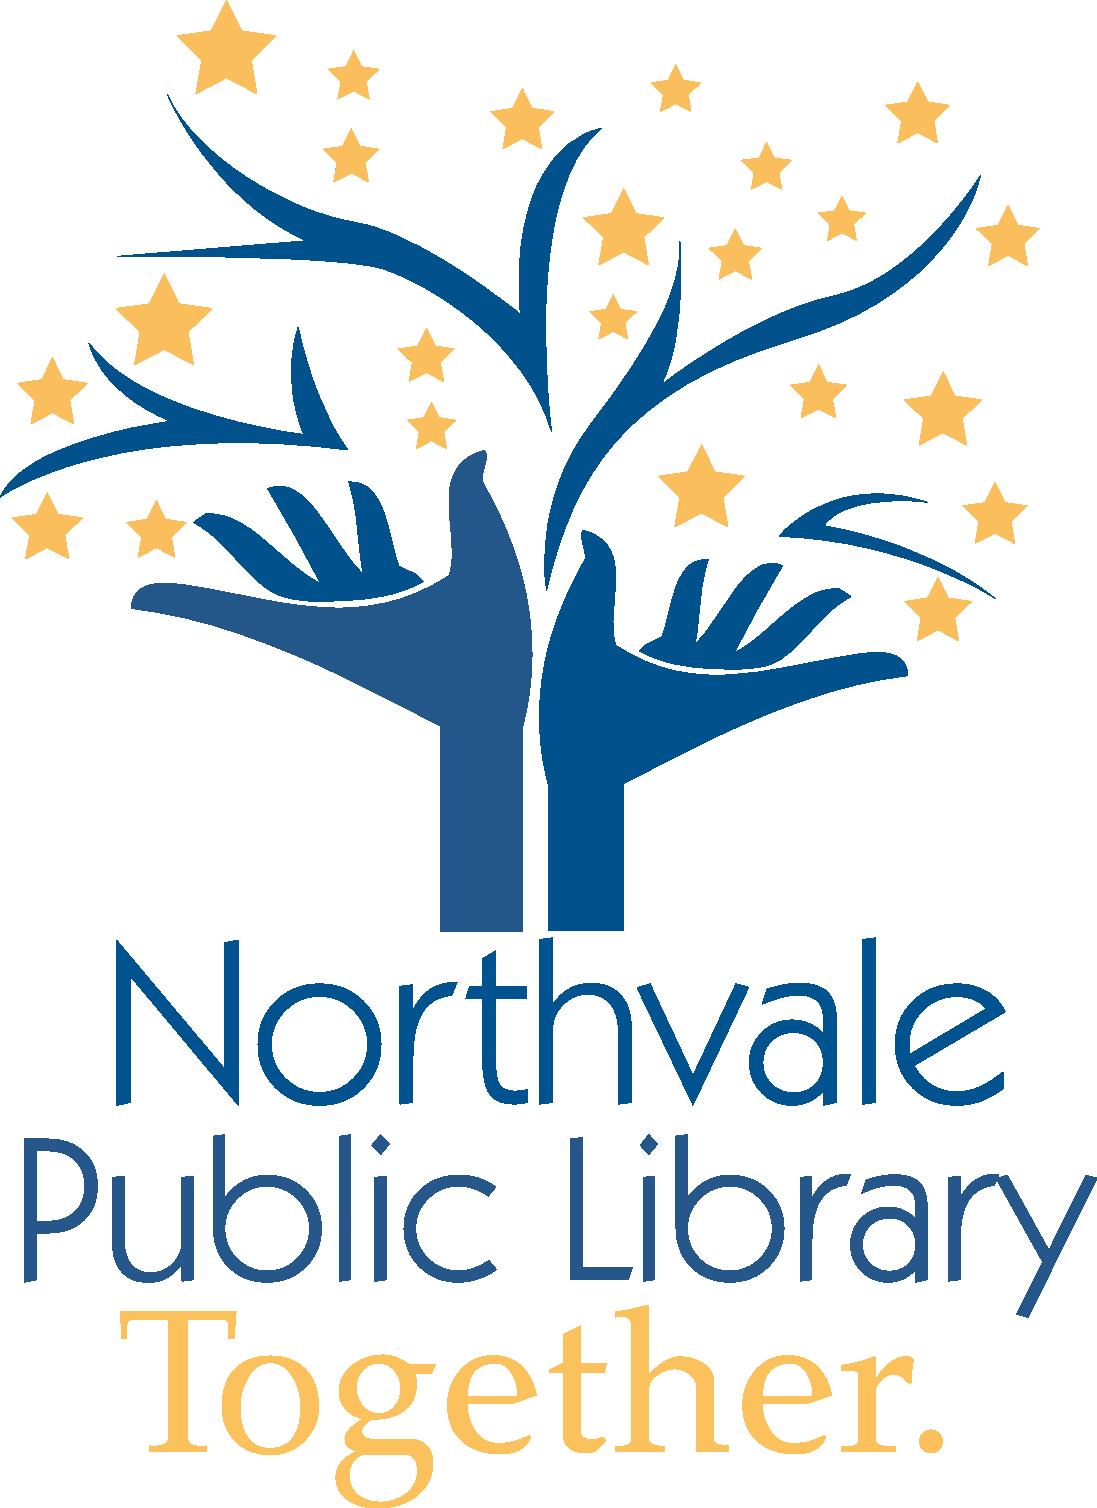 Storytime clipart october 2016 calendar. Northvale library